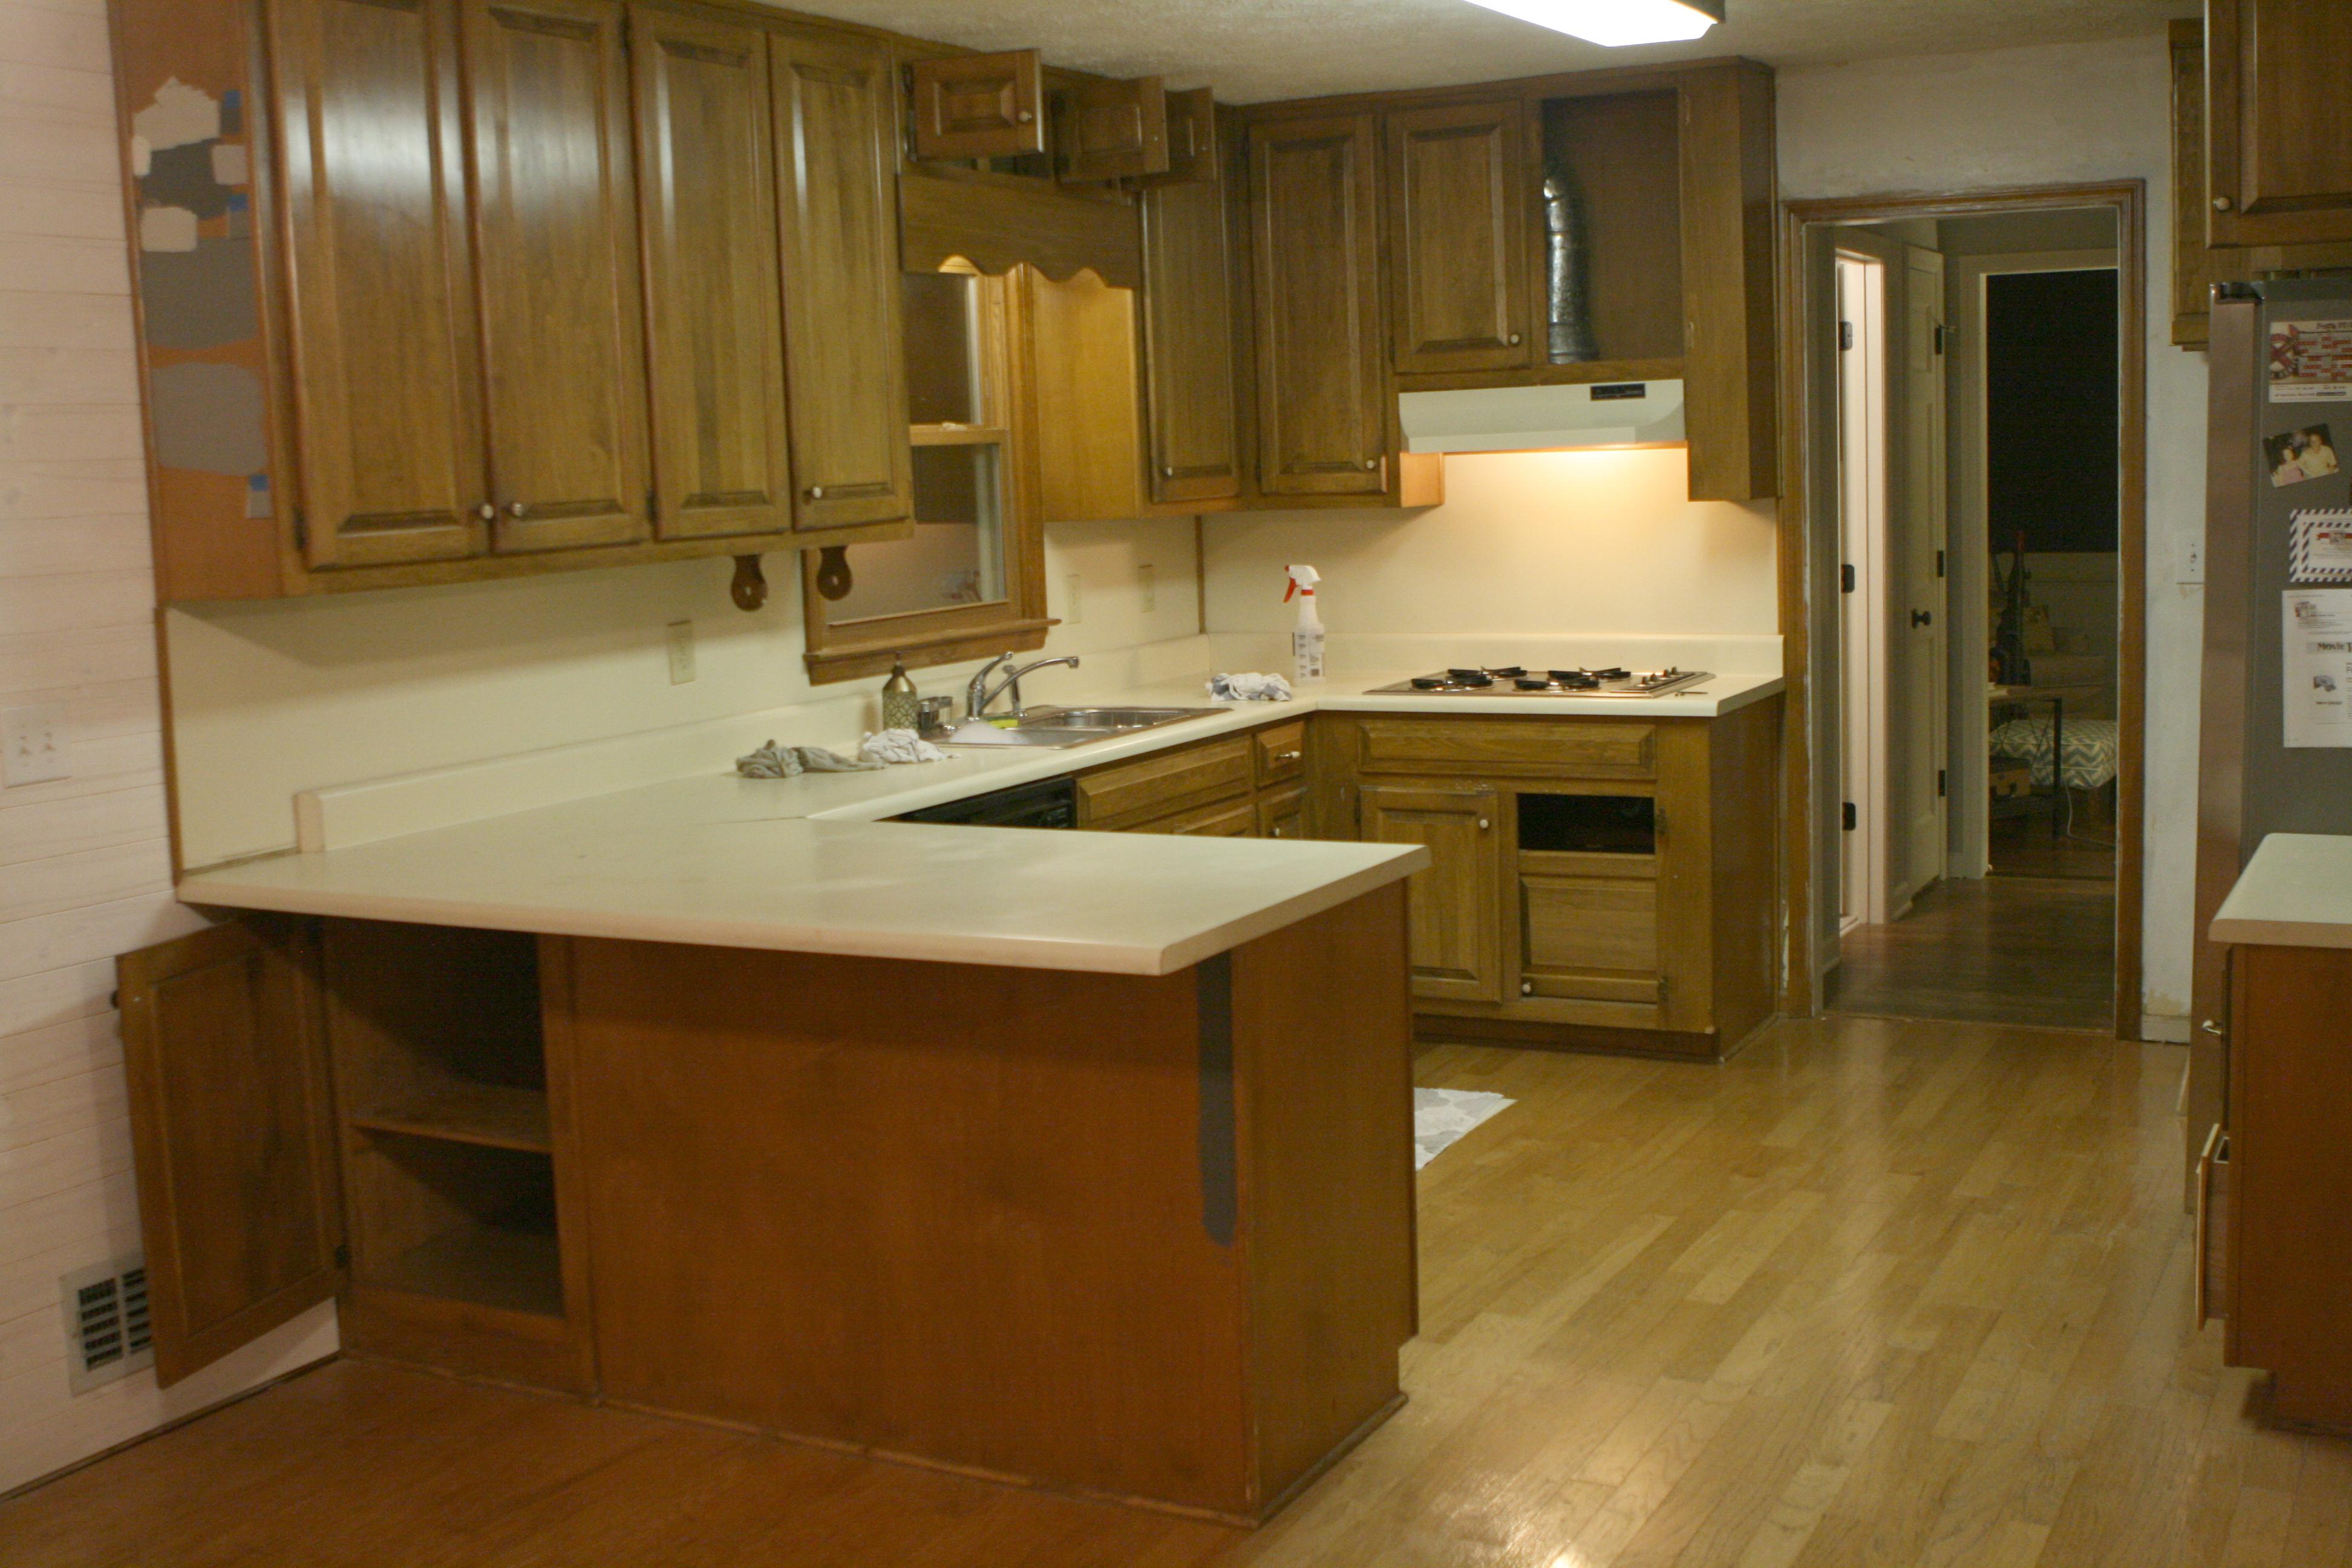 80's-kitchen-before-renovation